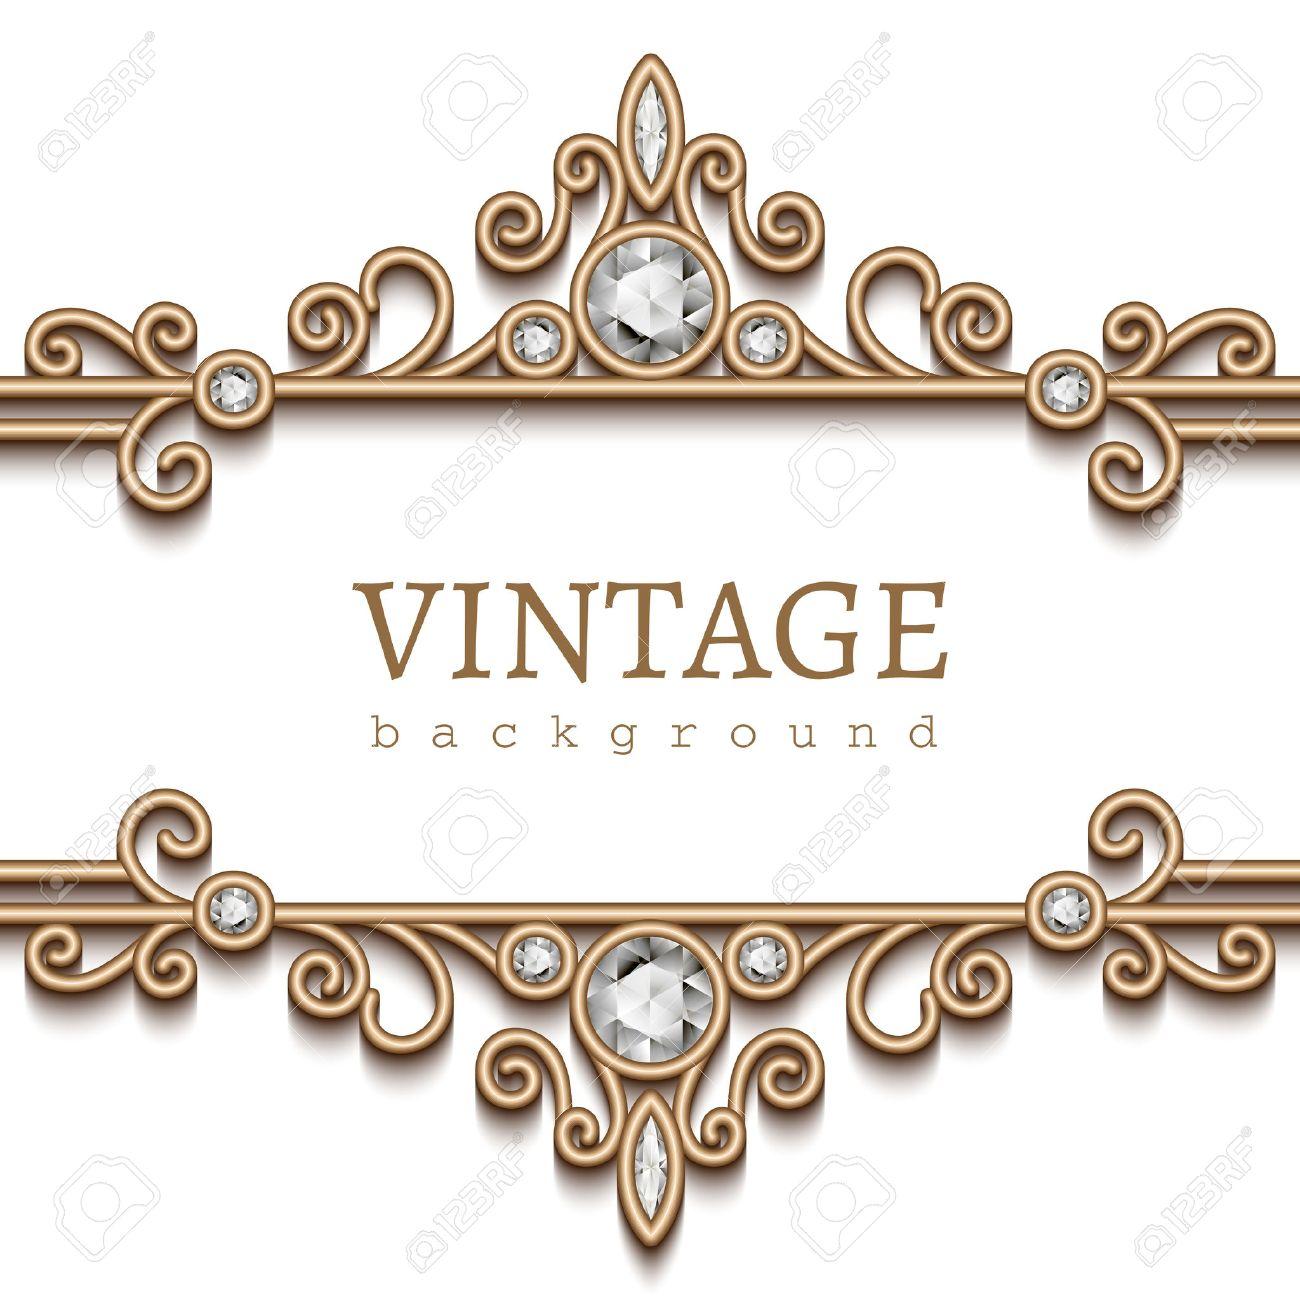 Vintage gold frame on white, divider, header, decorative jewelry background  Stock Vector -